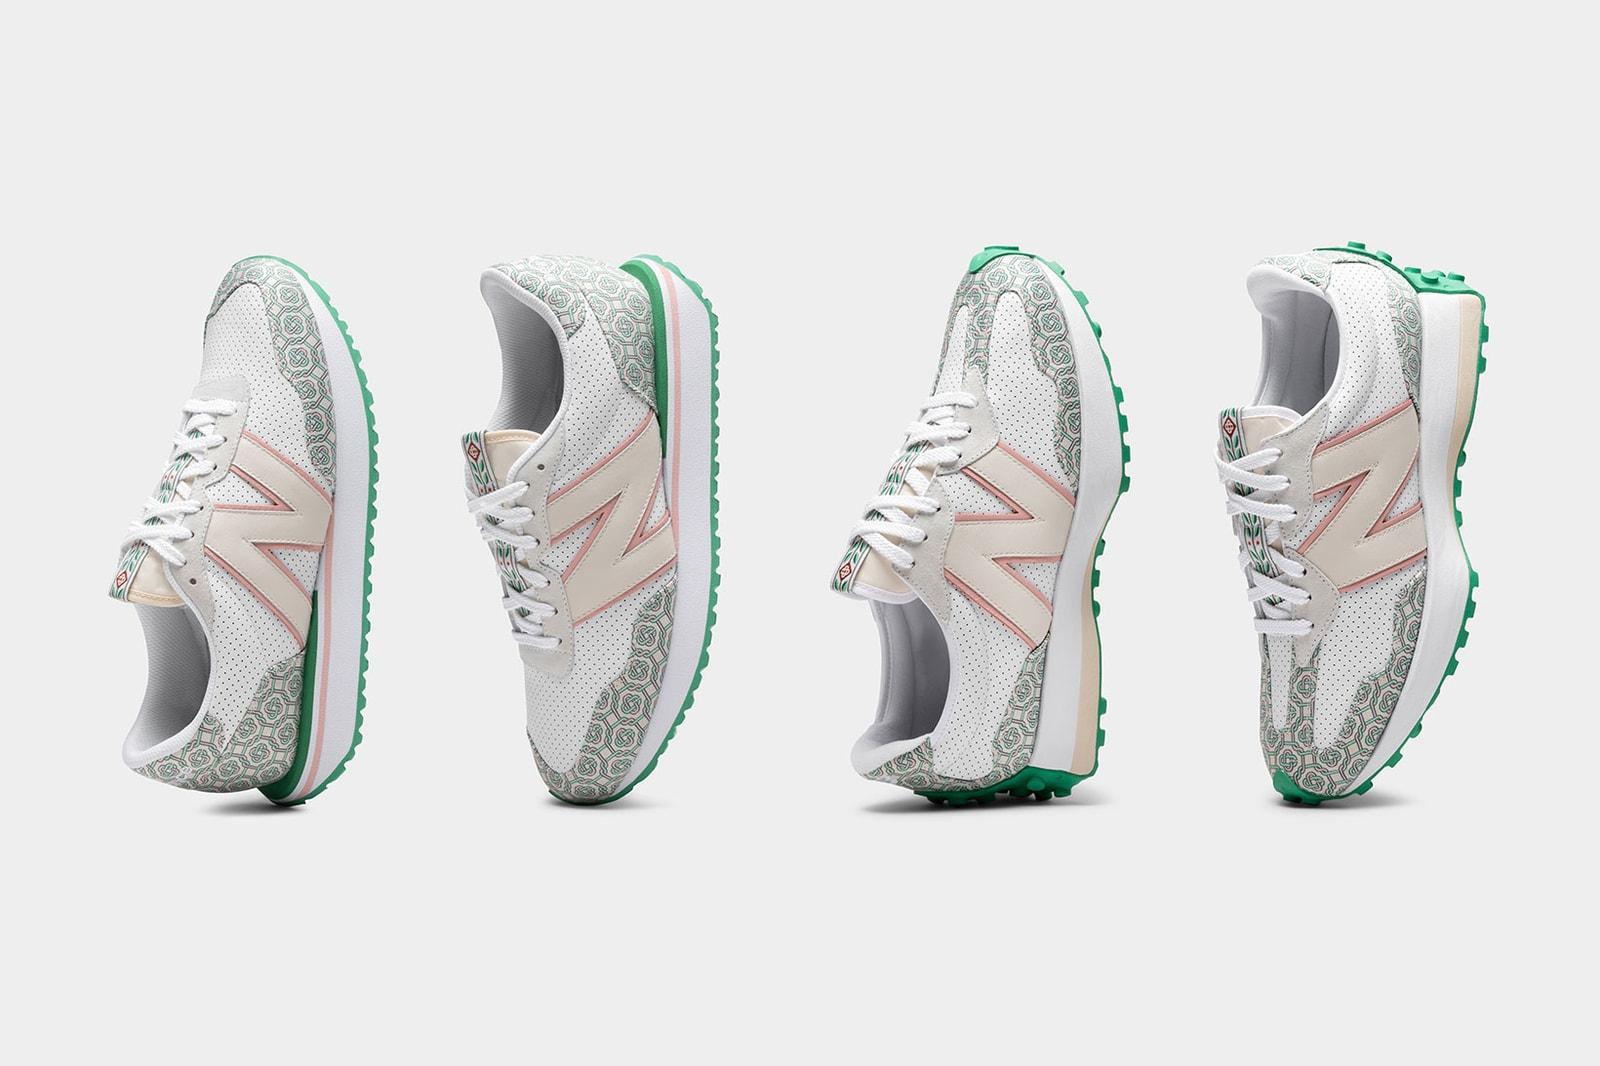 casablanca new balance sneakers collaboration nb 327 237